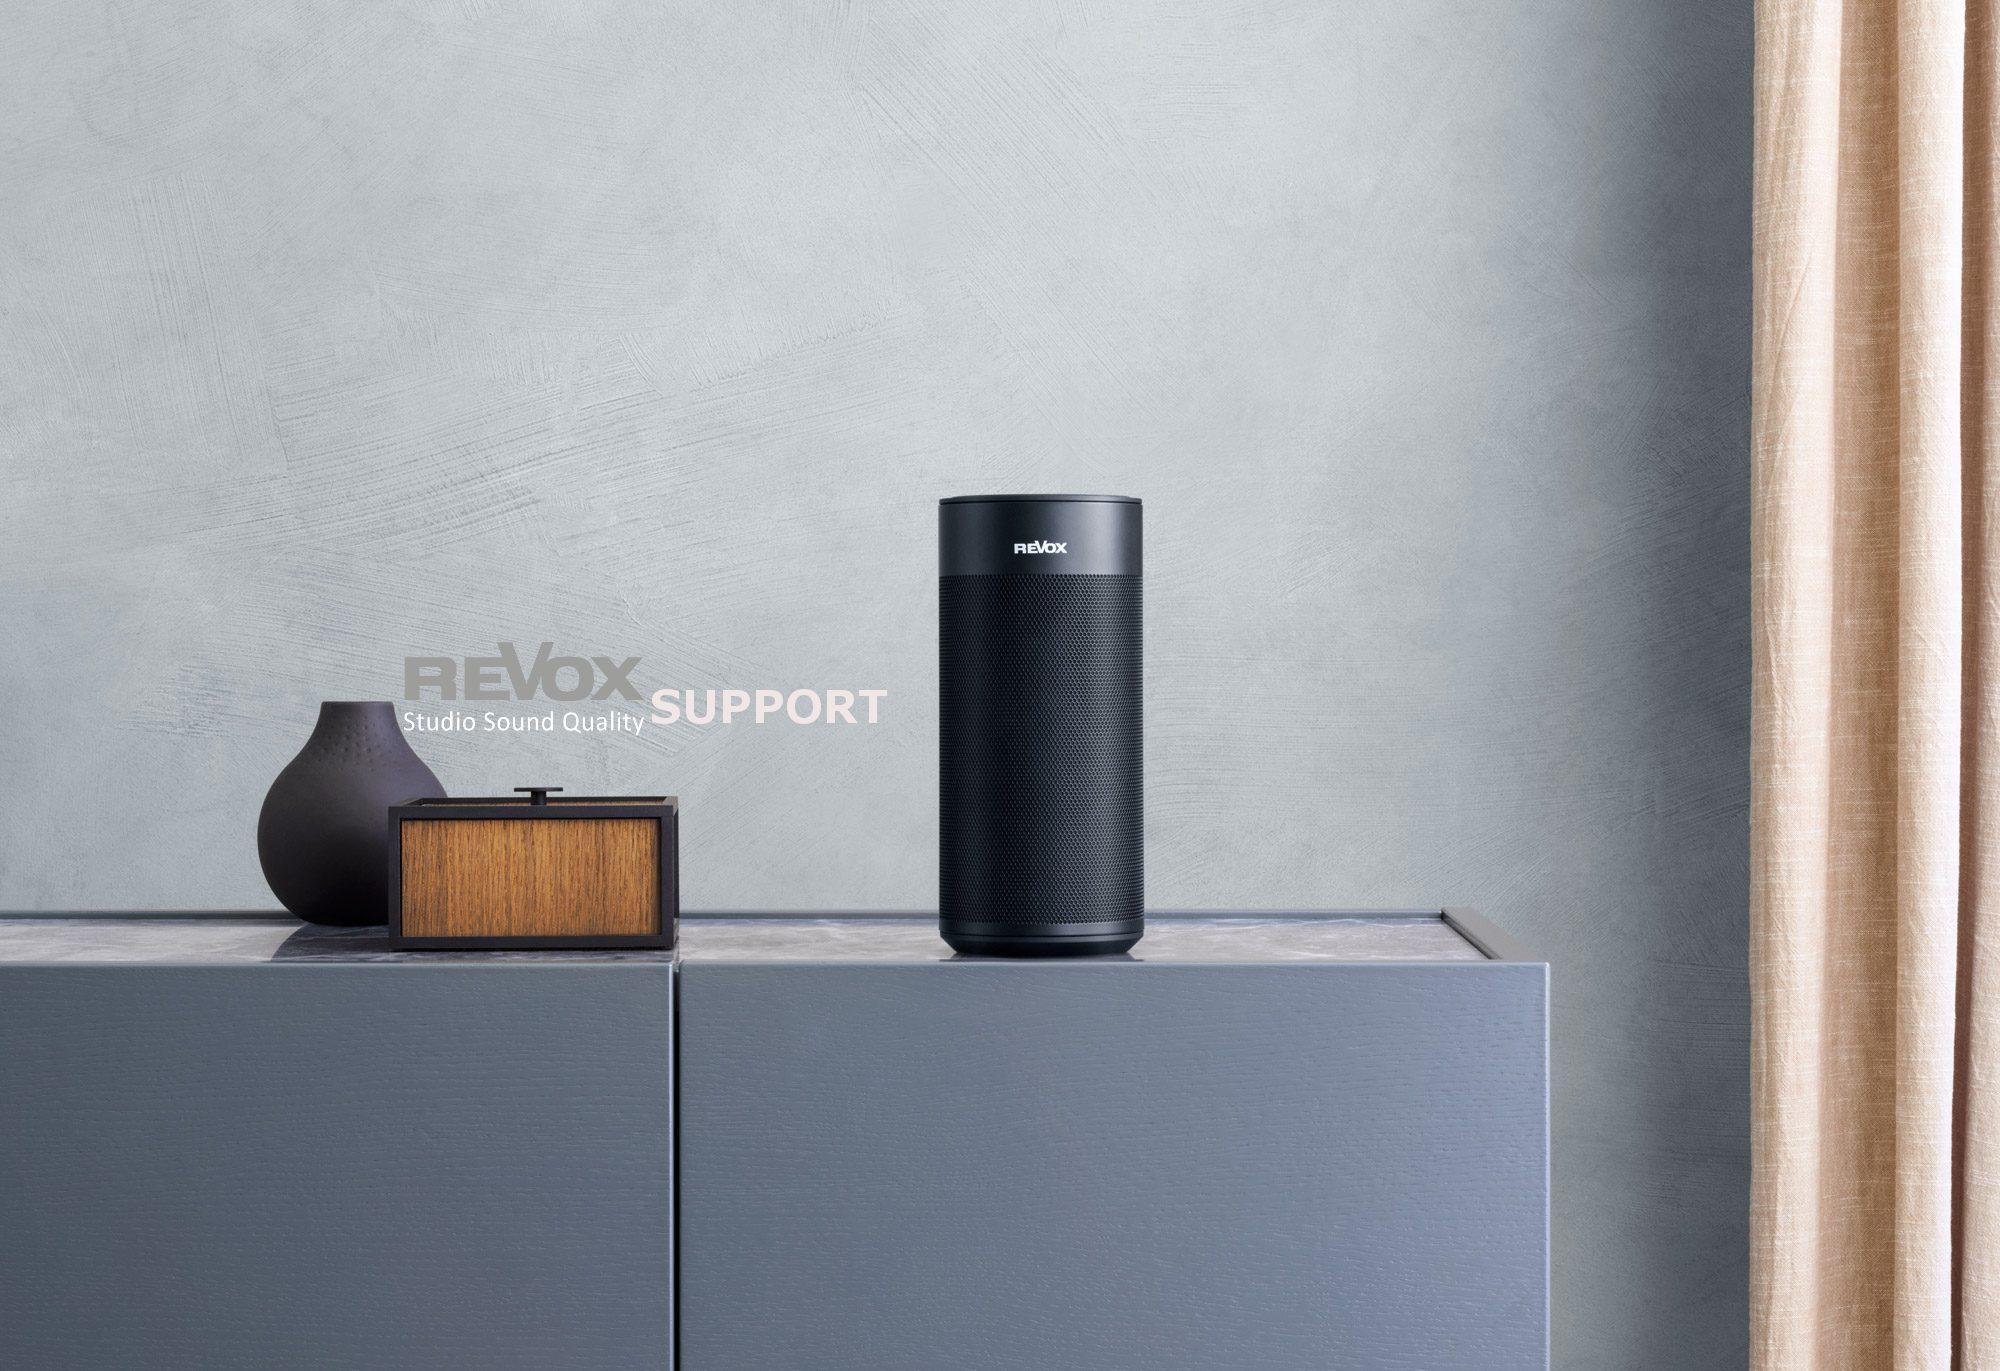 Revox Support Portal